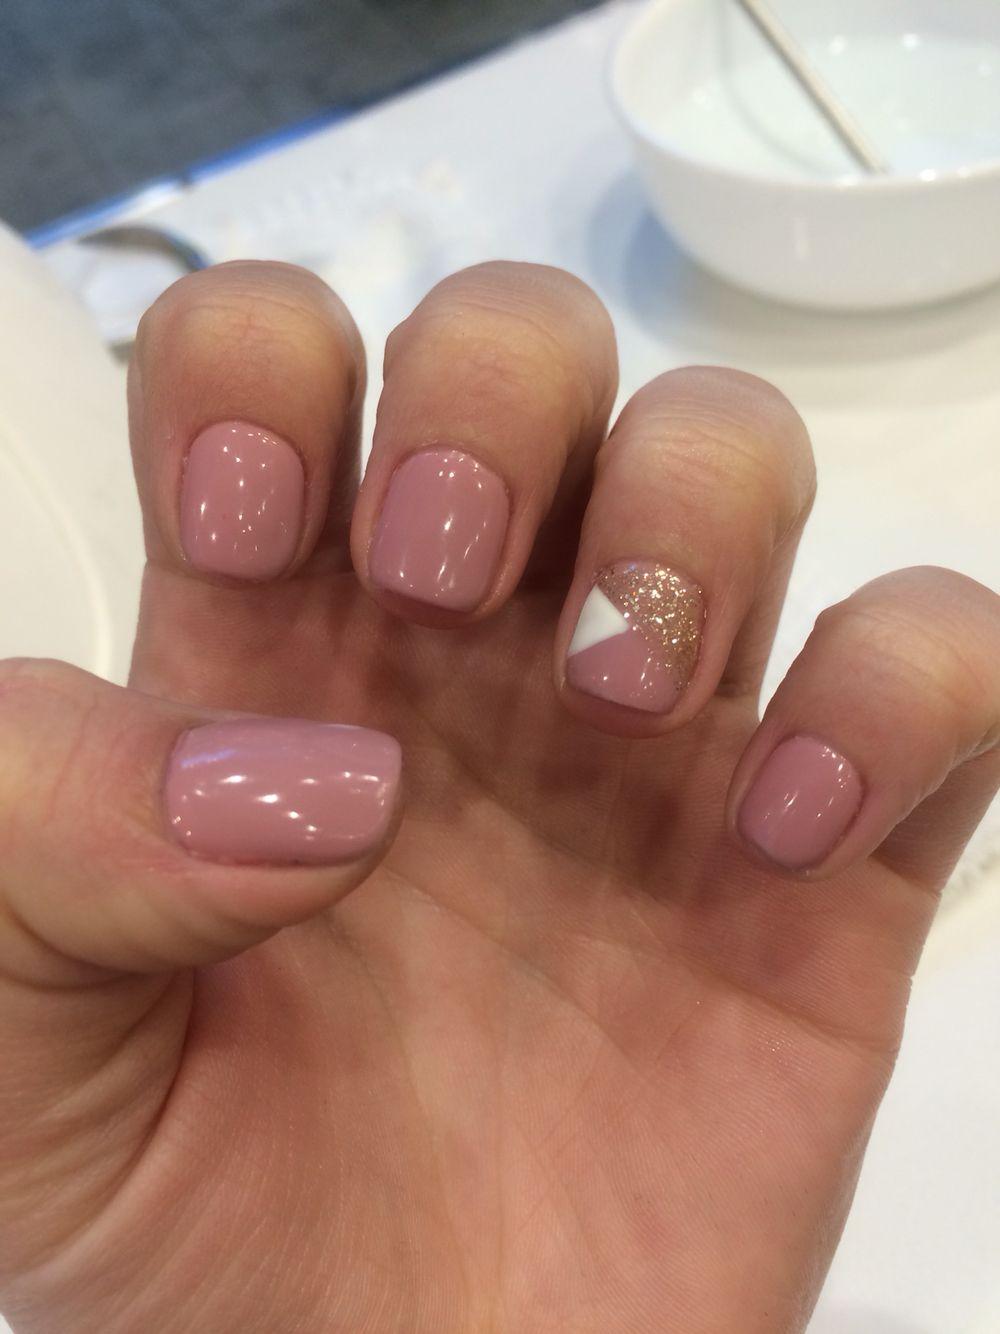 Gel#nails#short# simple # cute | Cute gel nails, Simple ...